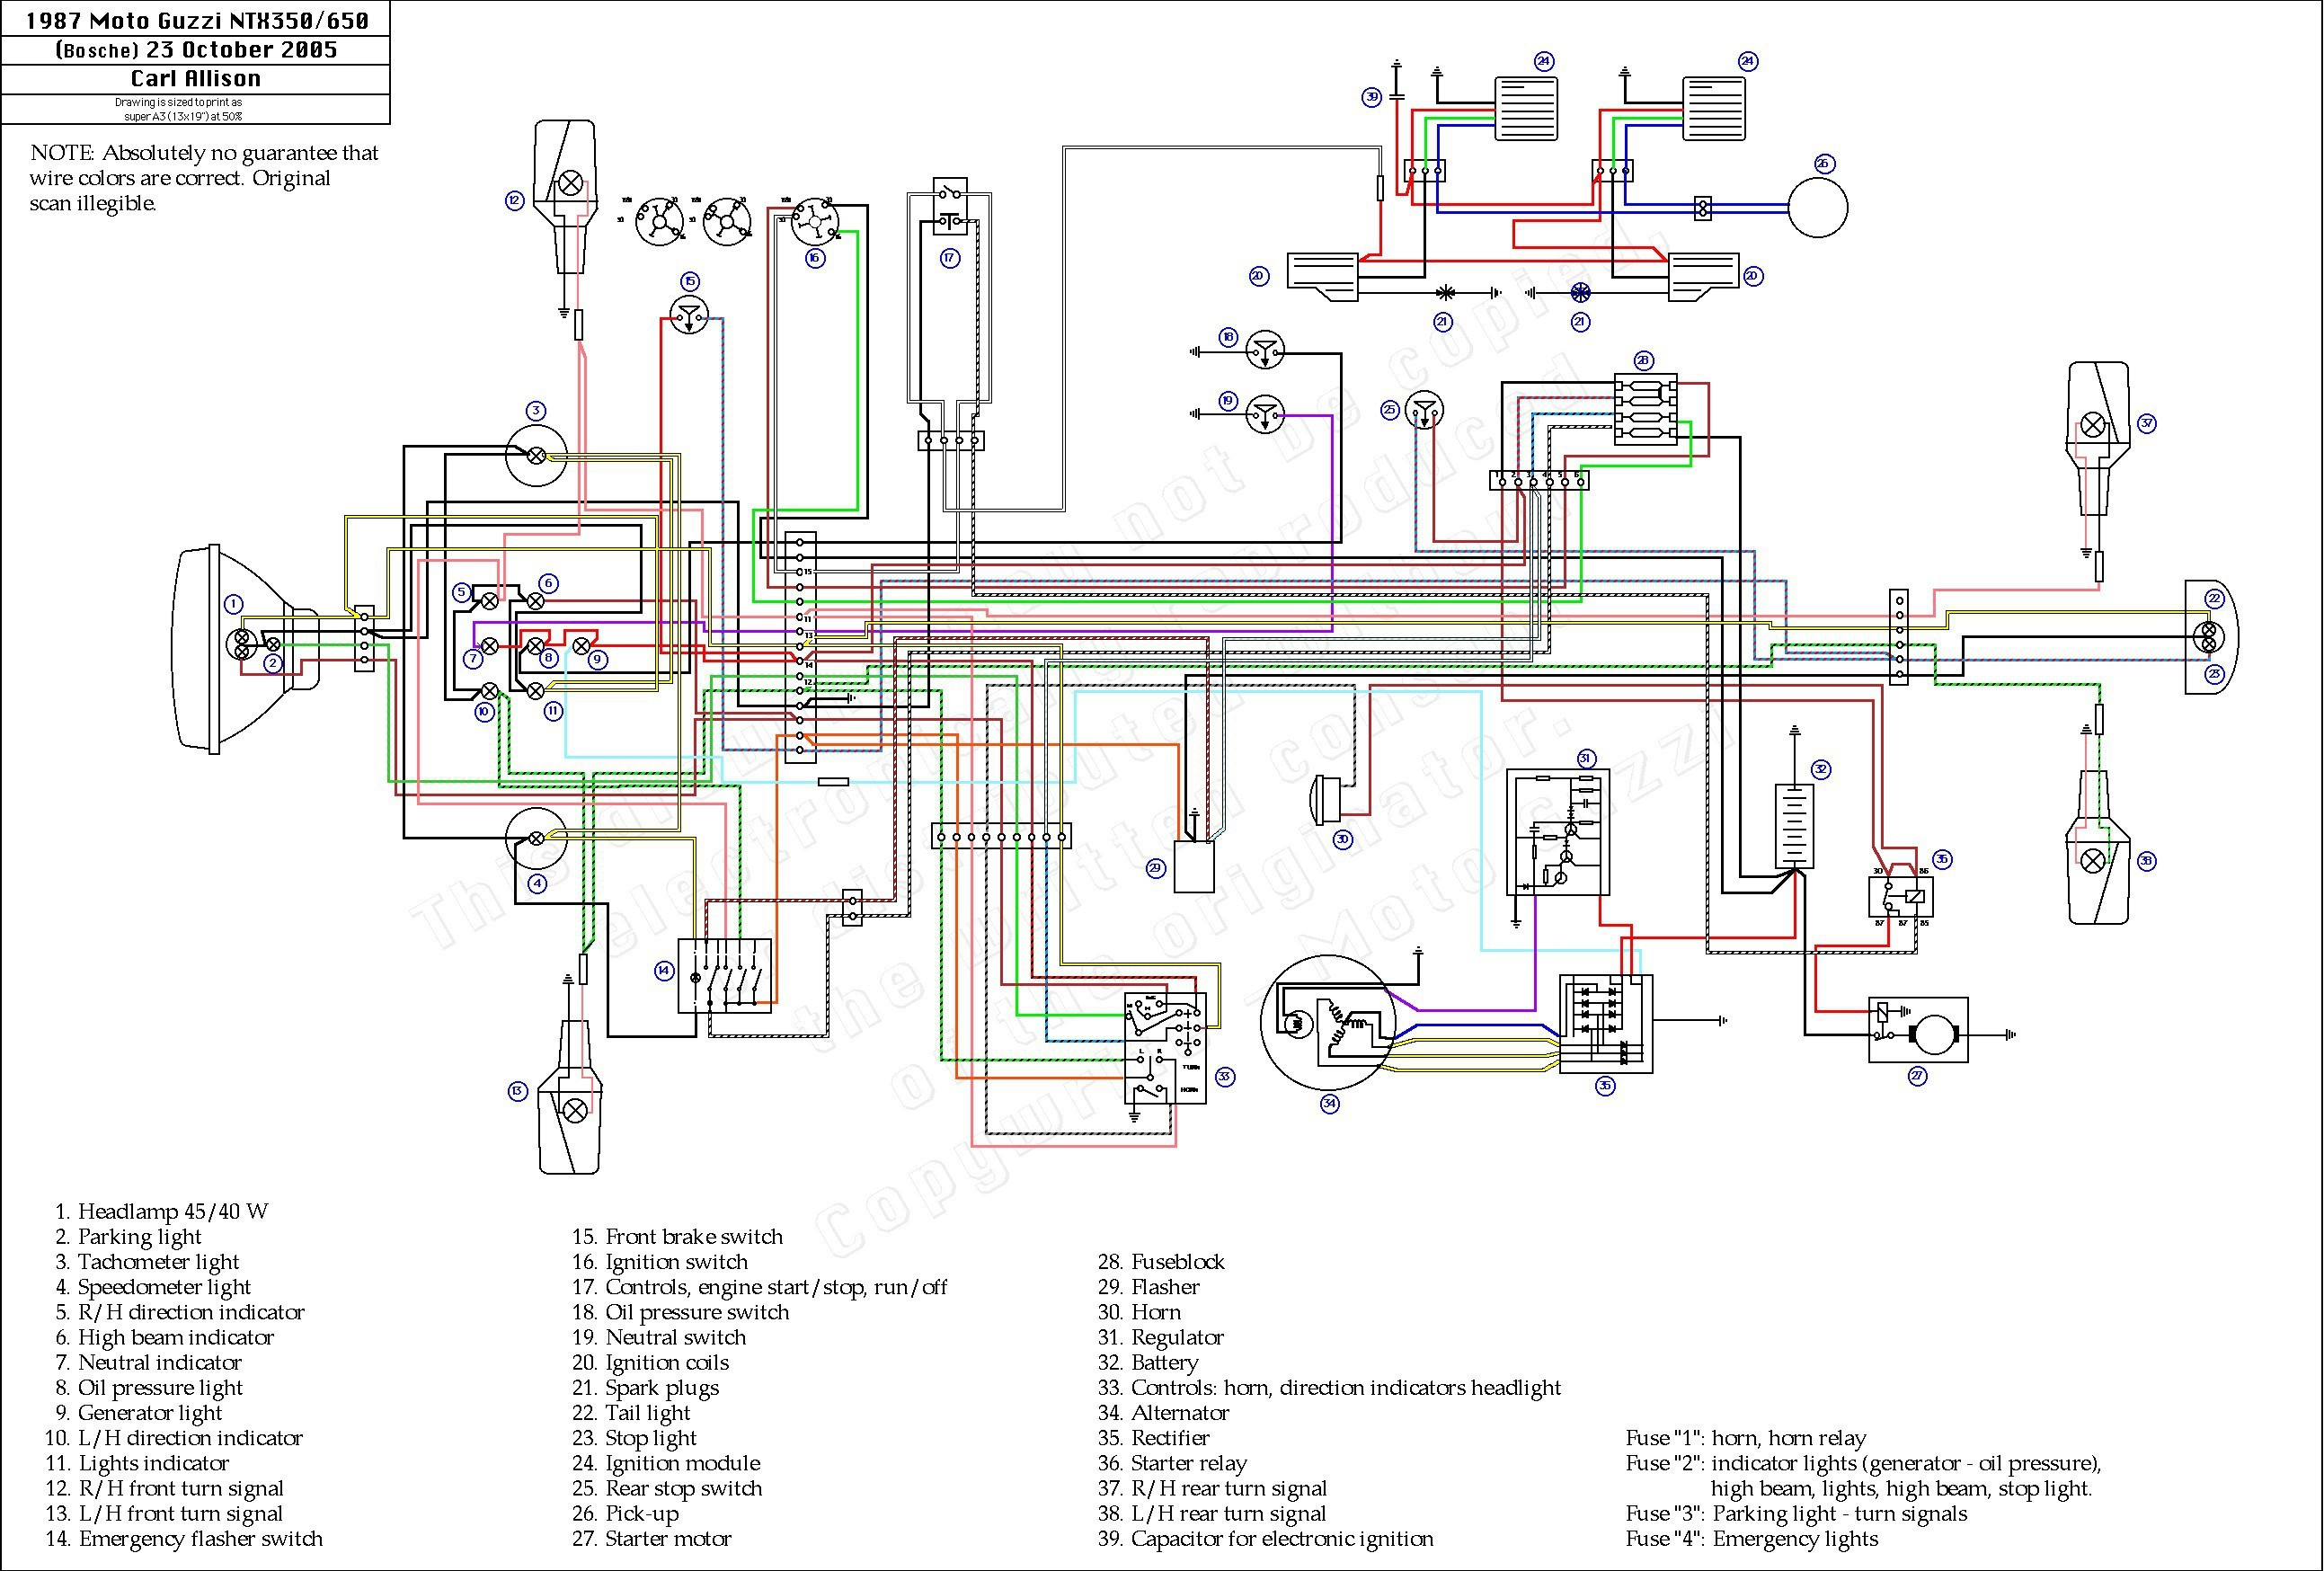 Tao Tao 110 Wiring Diagram 110 Schematic Wiring Diagram with Fuse Wiring Diagram Of Tao Tao 110 Wiring Diagram